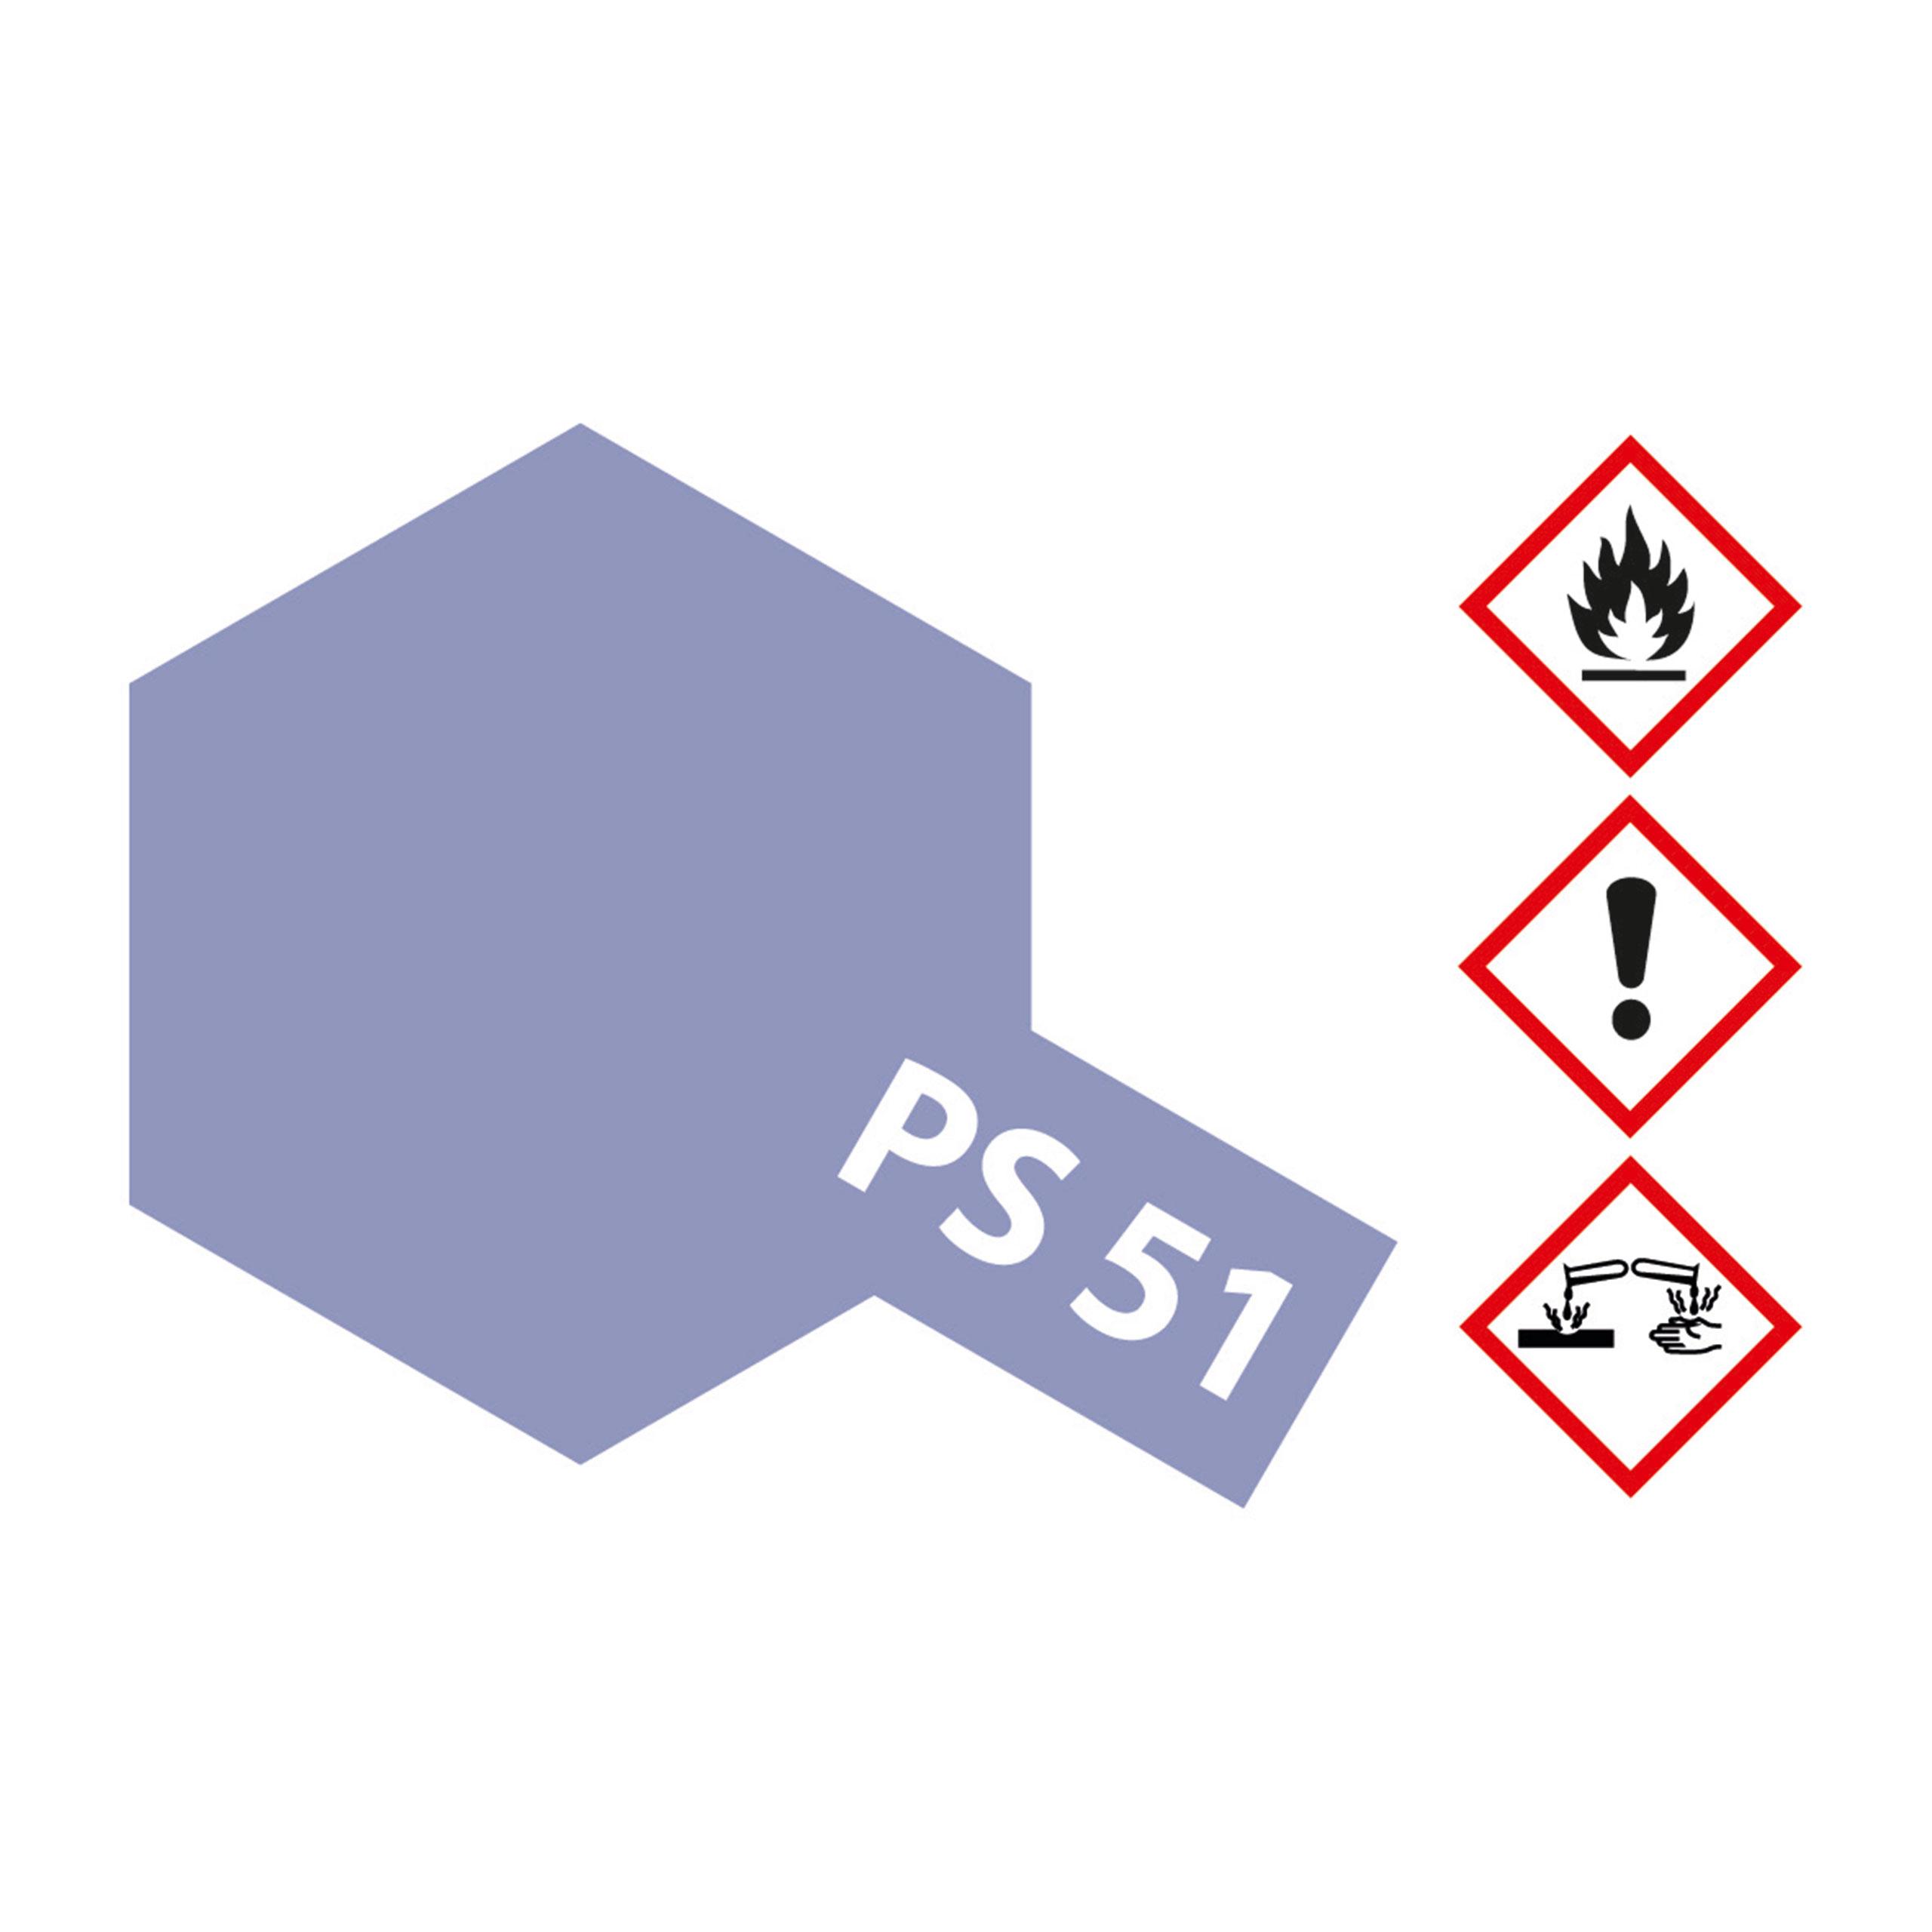 PS-51 Violett eloxiert Polycarb. - 100ml Sprayfarbe Lexan - Tamiya 300086051